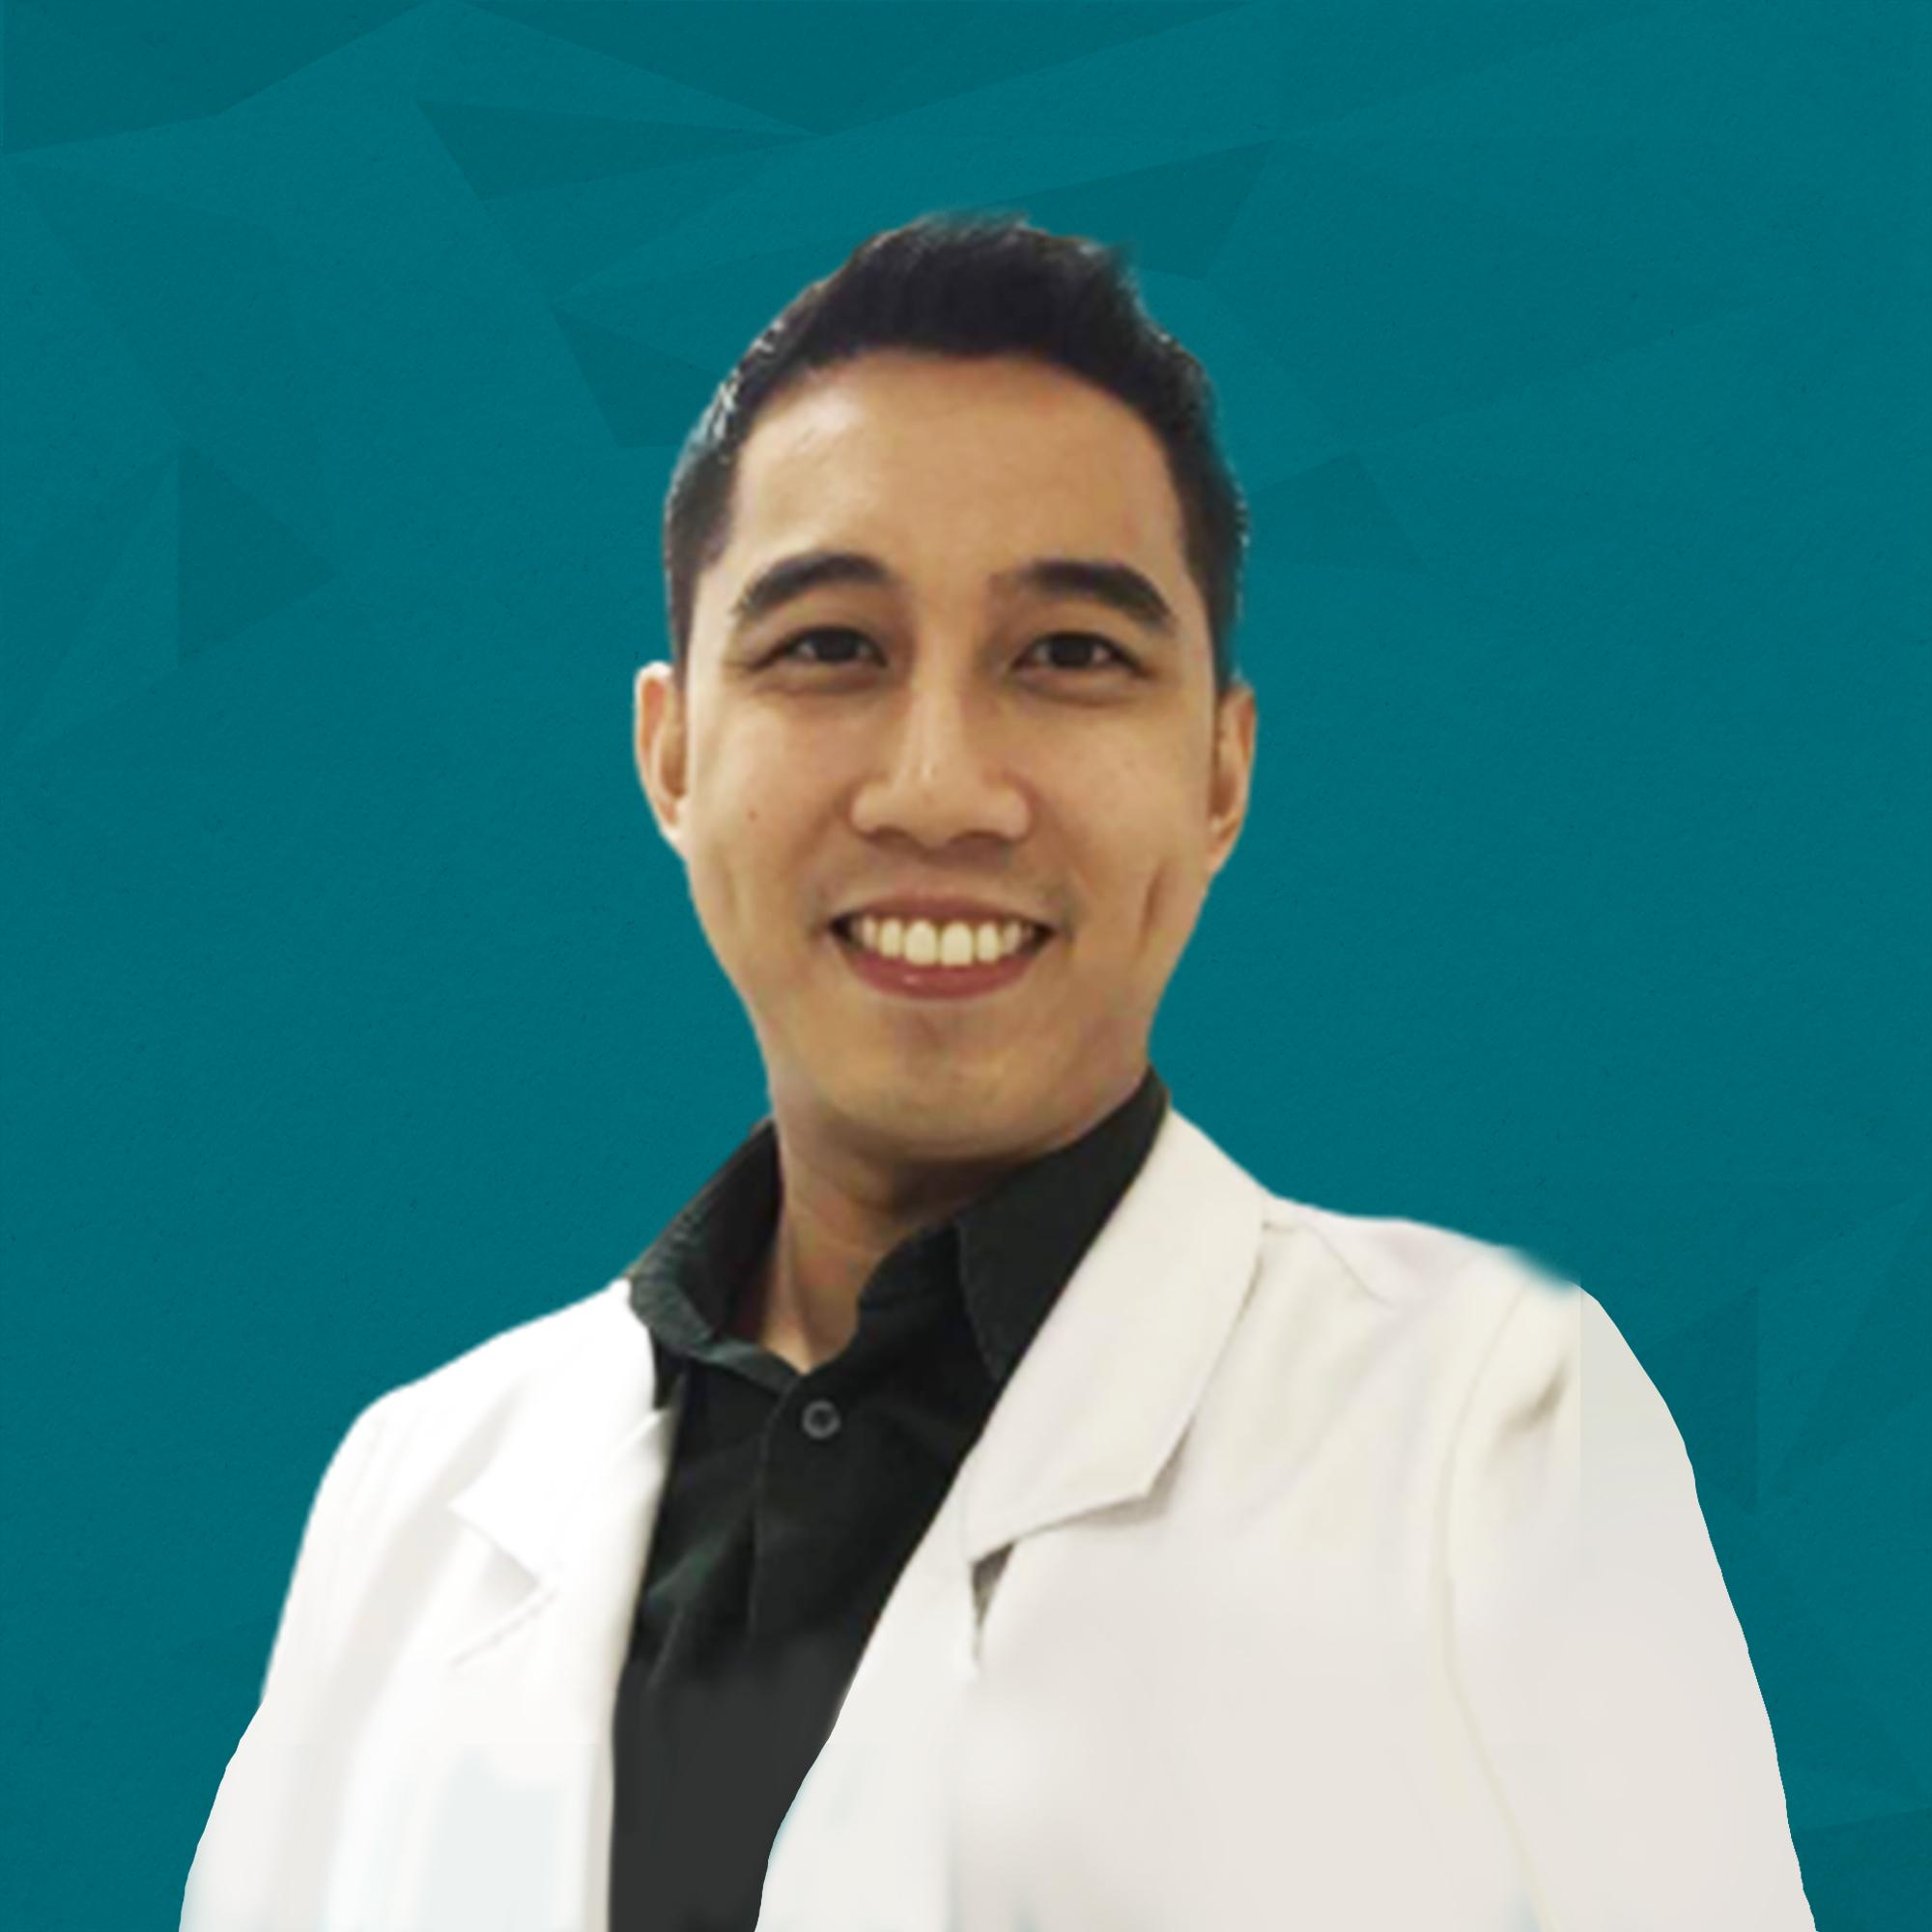 DR. MERTON, ARMAND